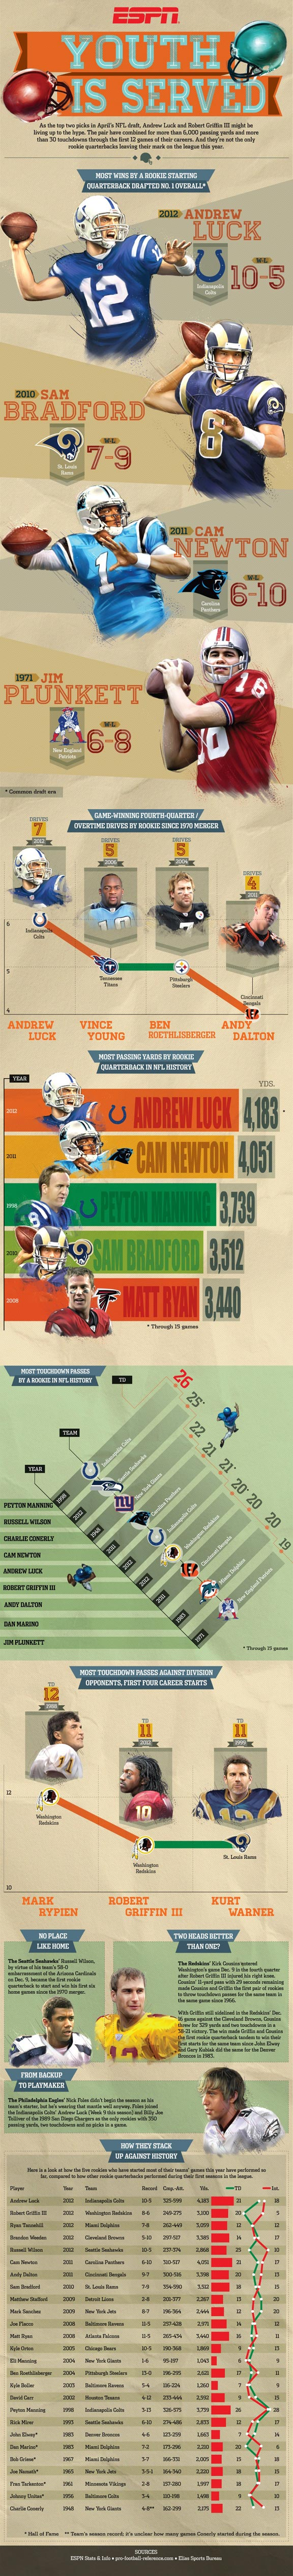 NFL Rookie Statistics